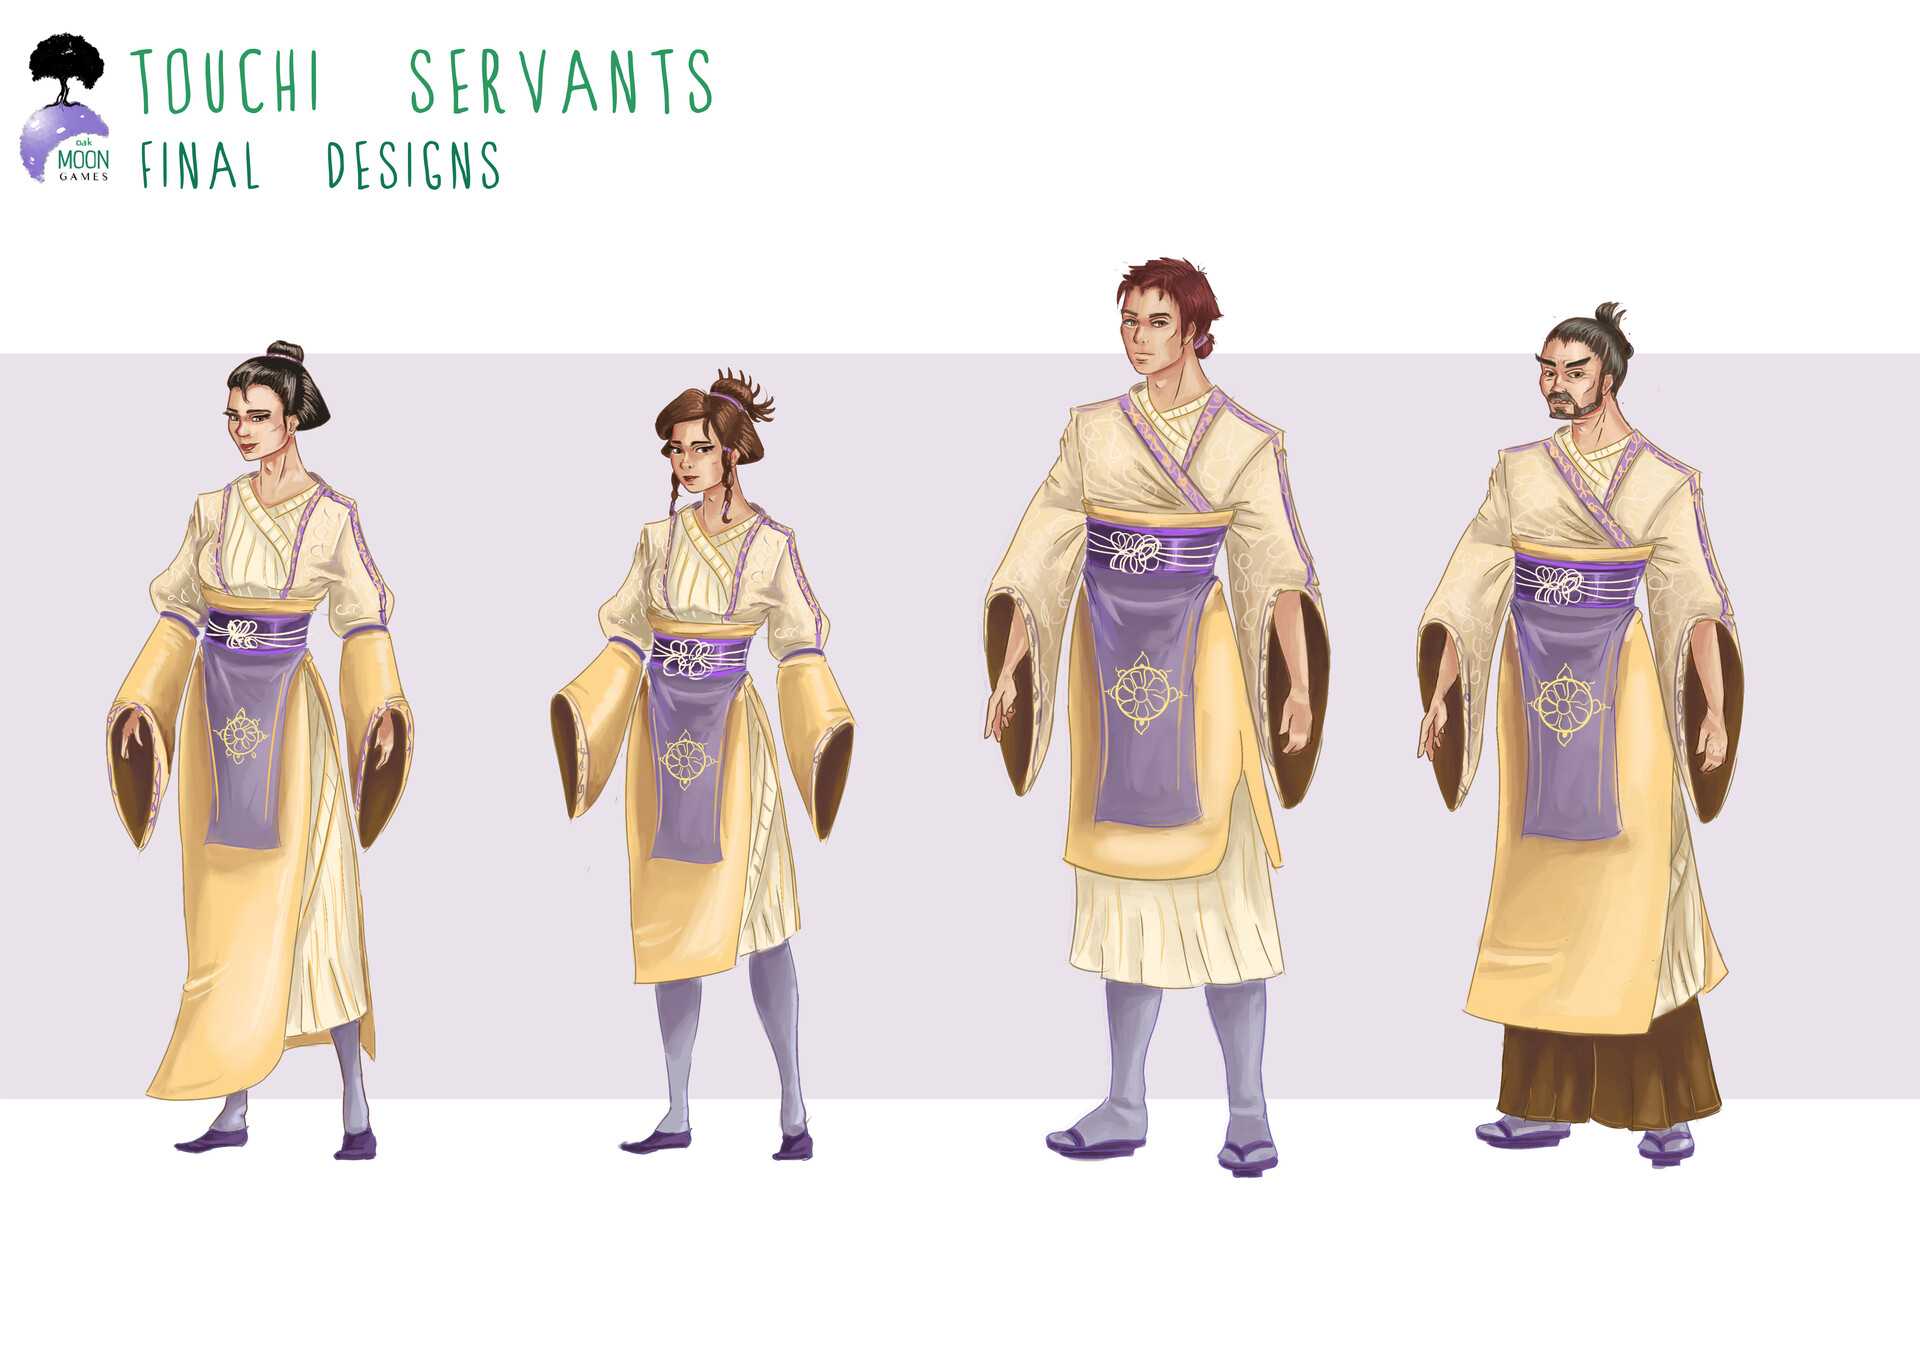 Servant final designs